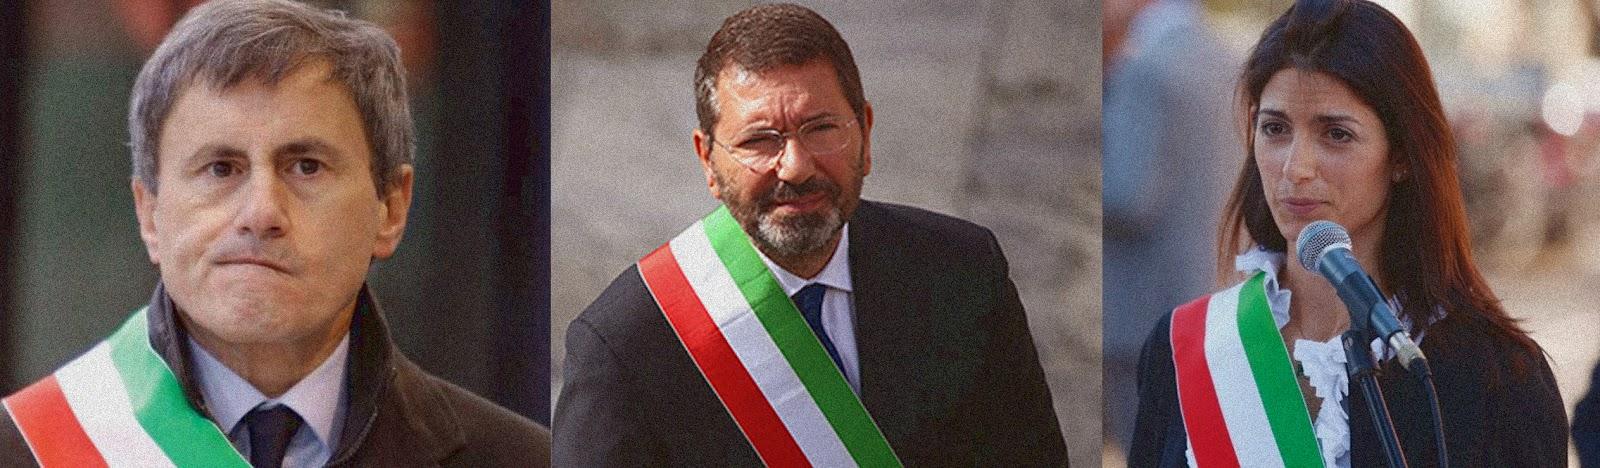 sindaci Roma.jpg